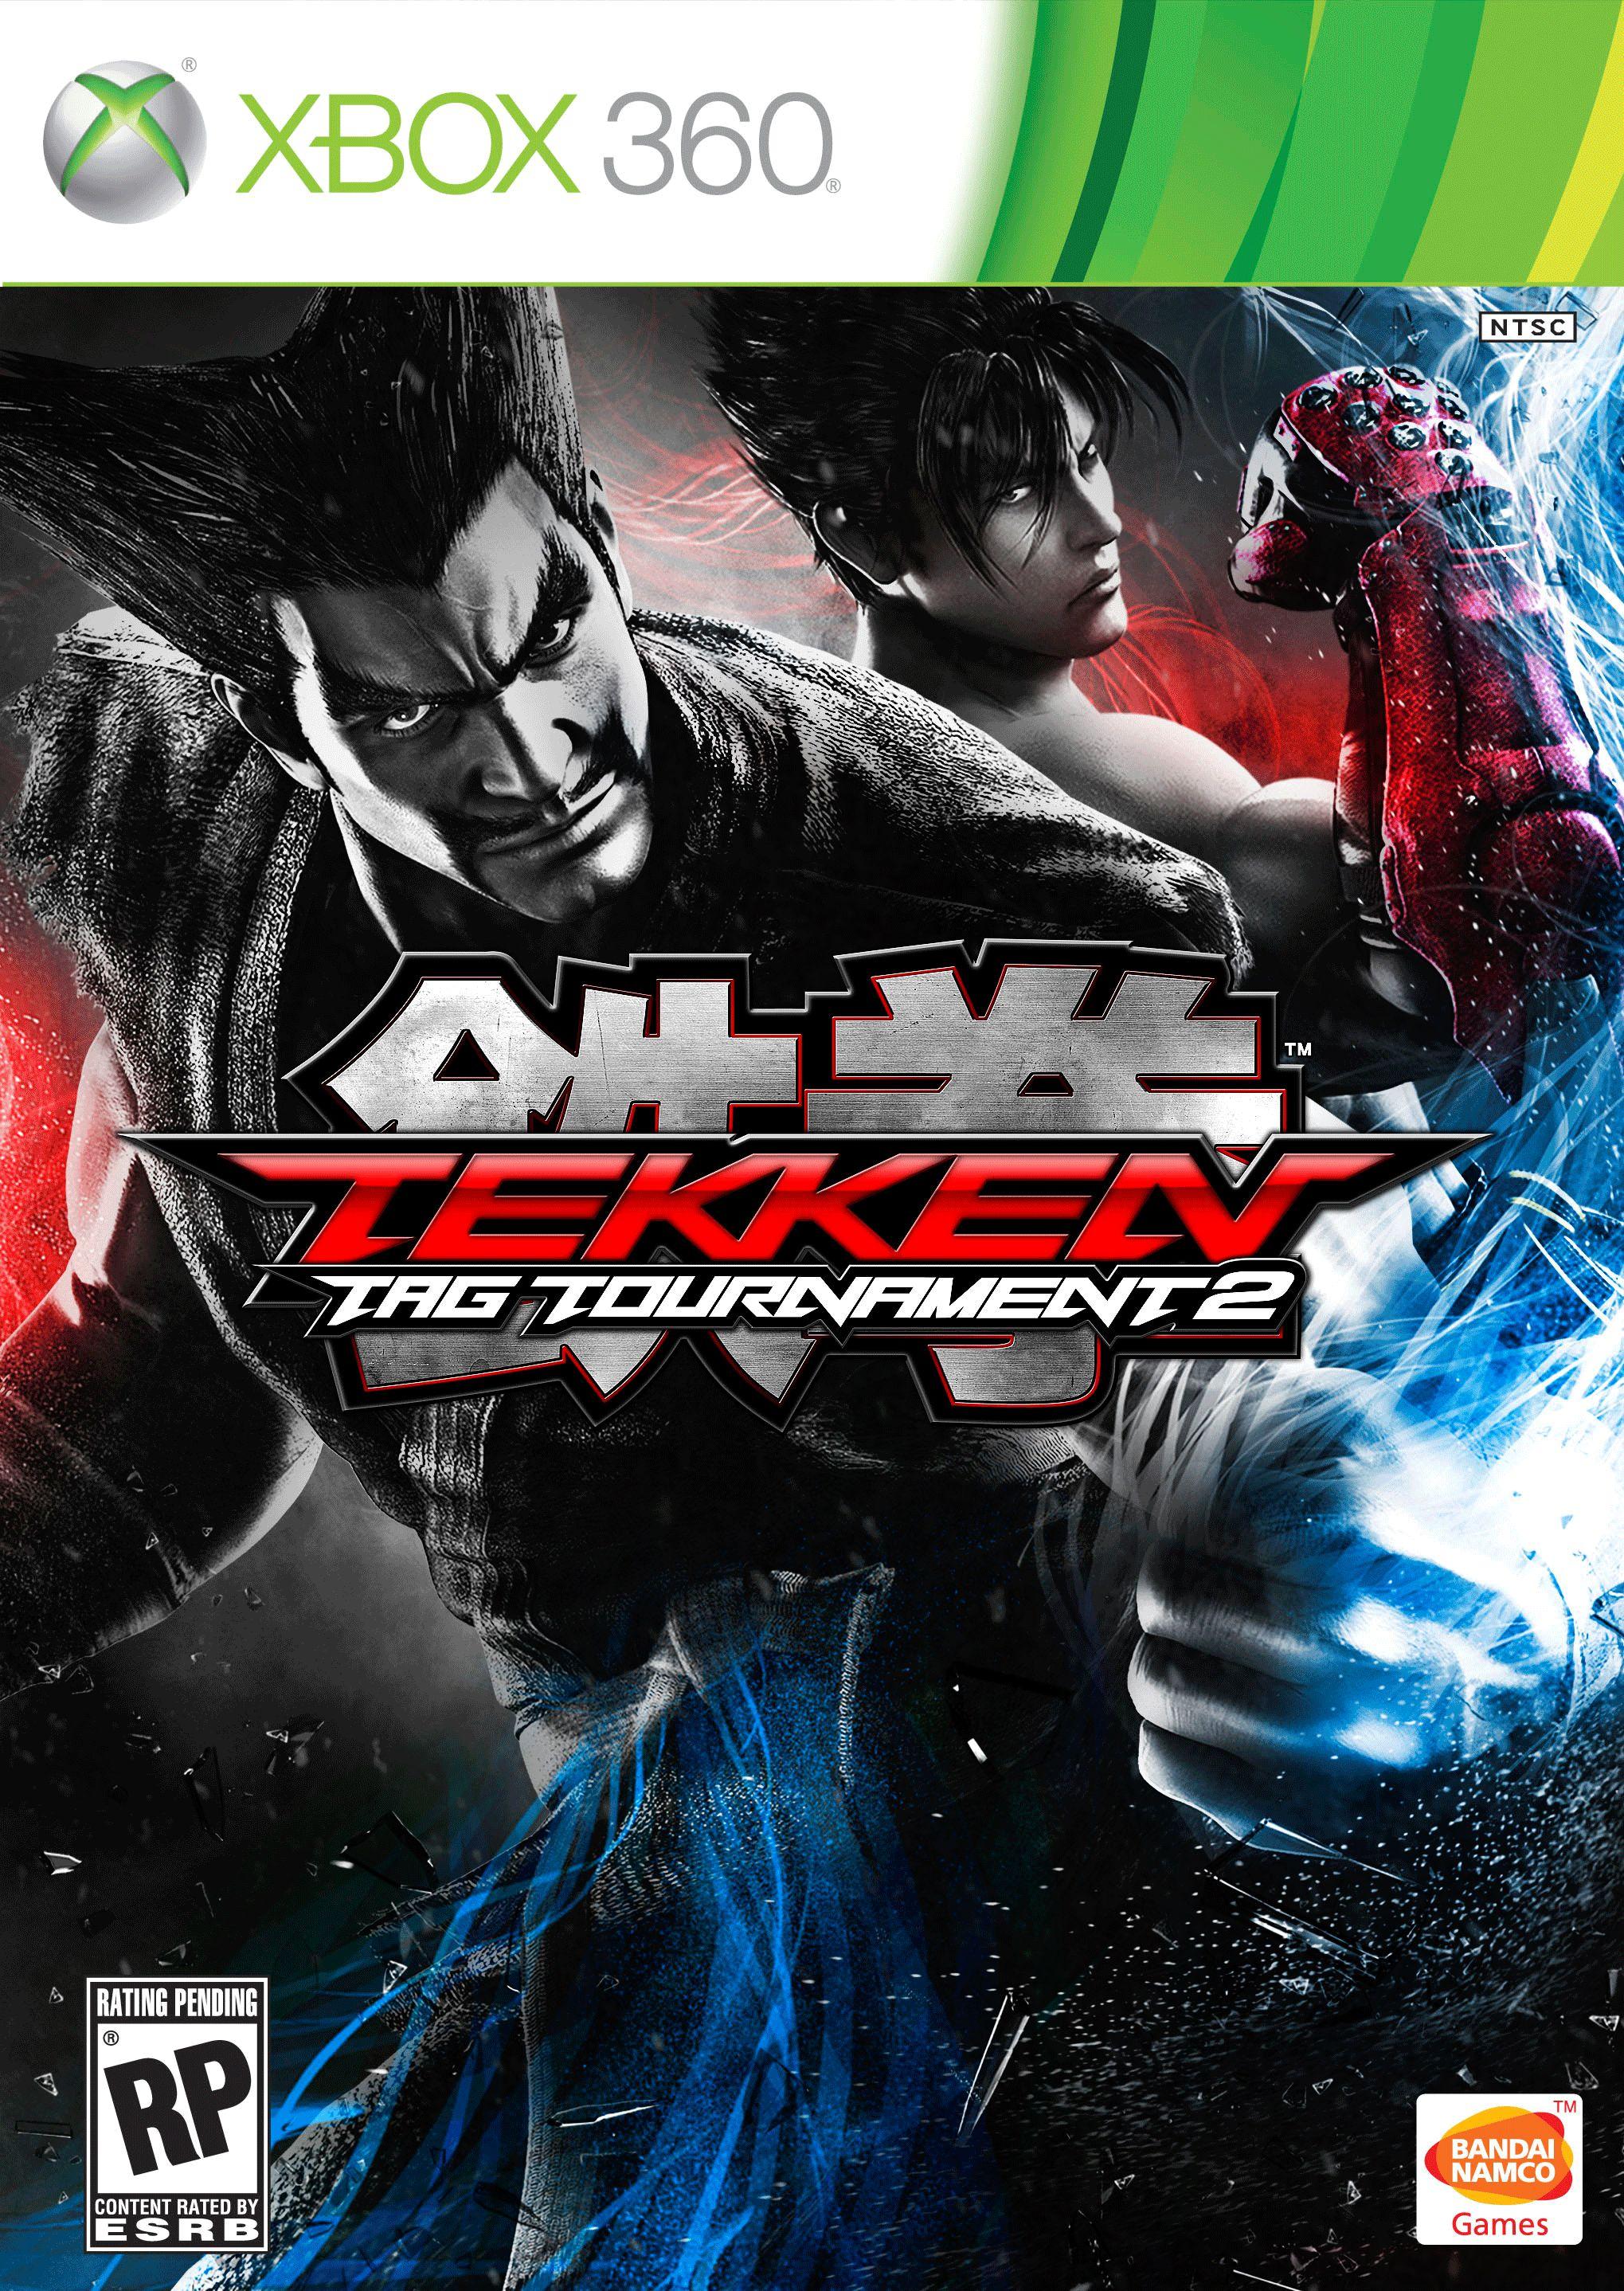 Бокс-арт (Xbox 360) - Tekken Tag Tournament 2